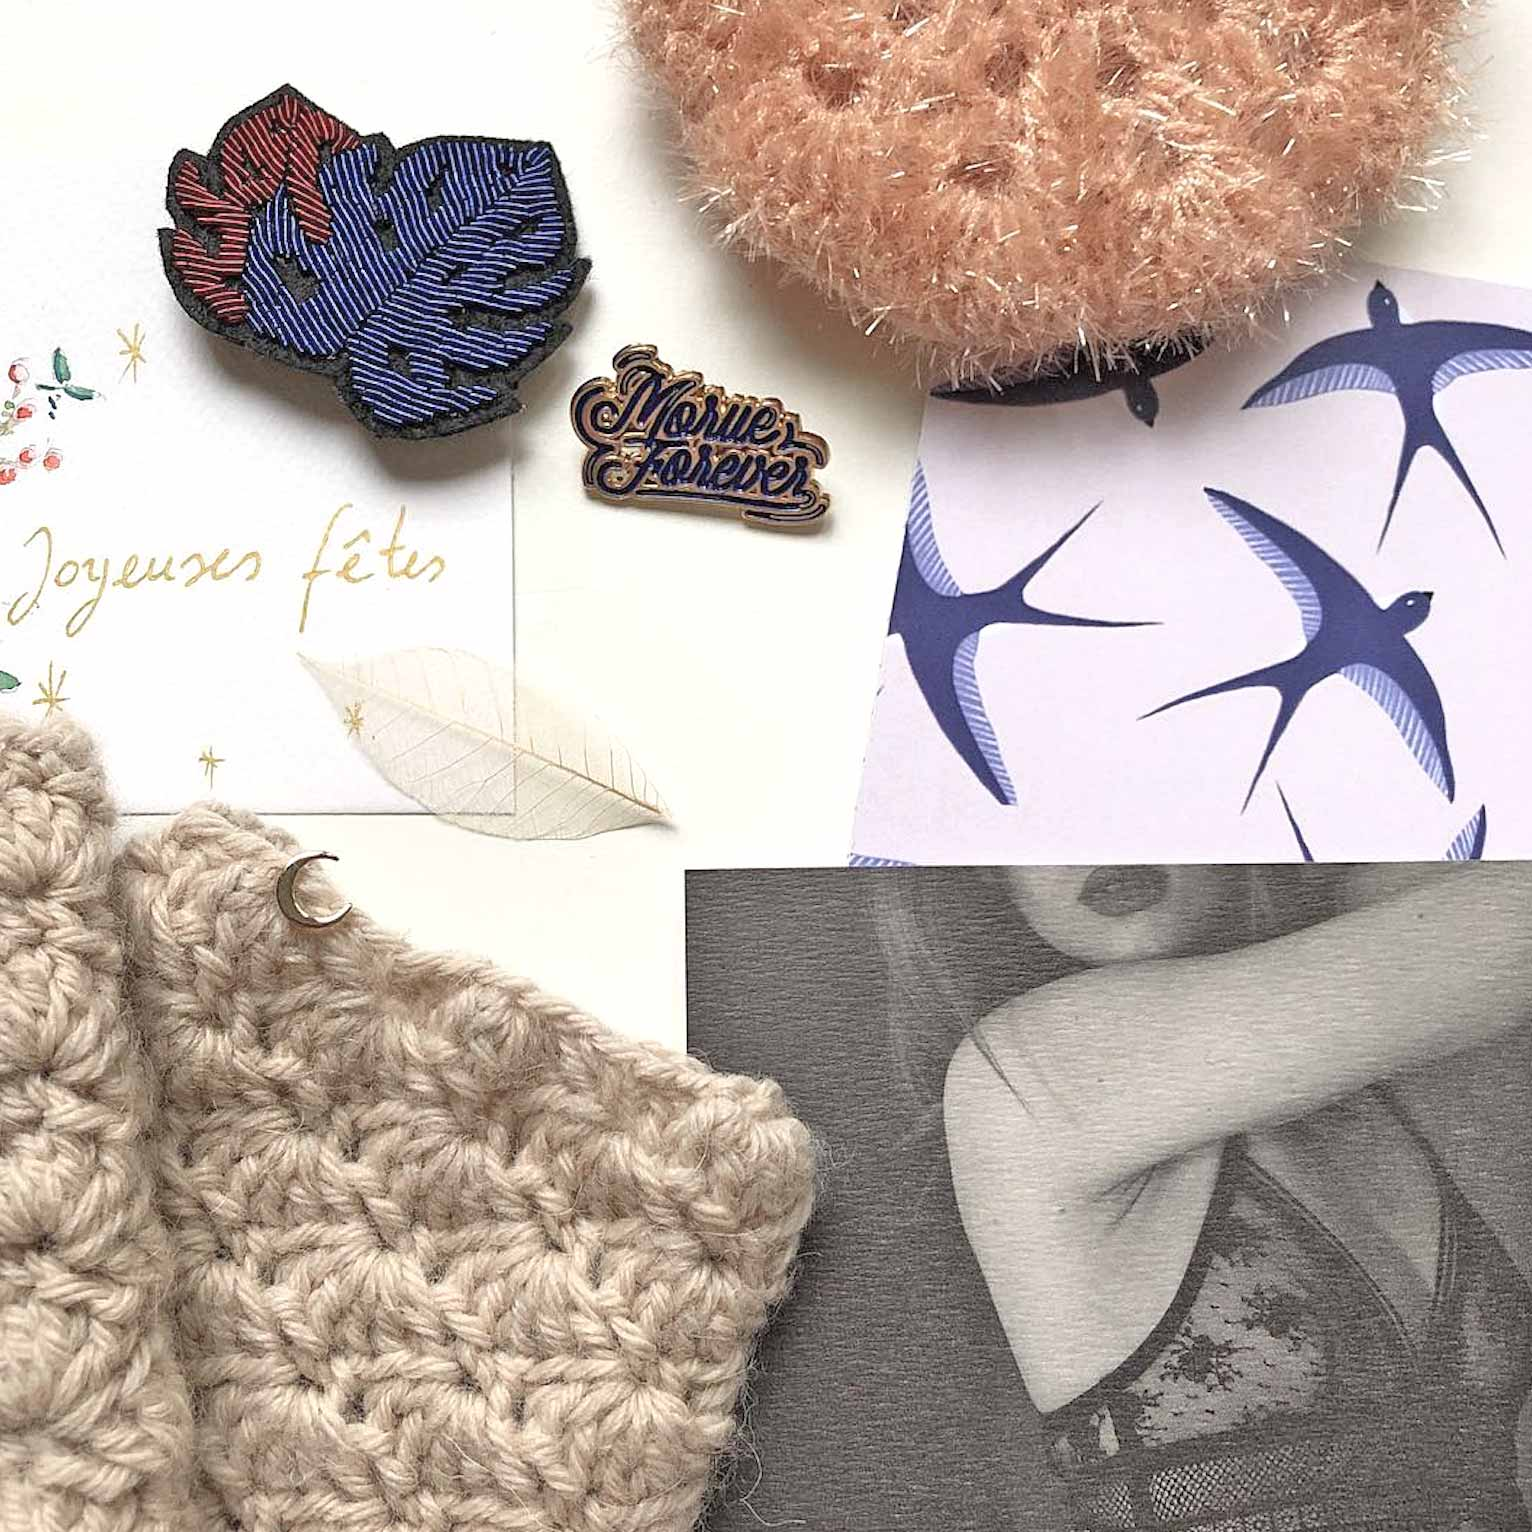 aufilduneimage éponge tawashi creative bubble ricodesign DIY laboutiquedemelimelo